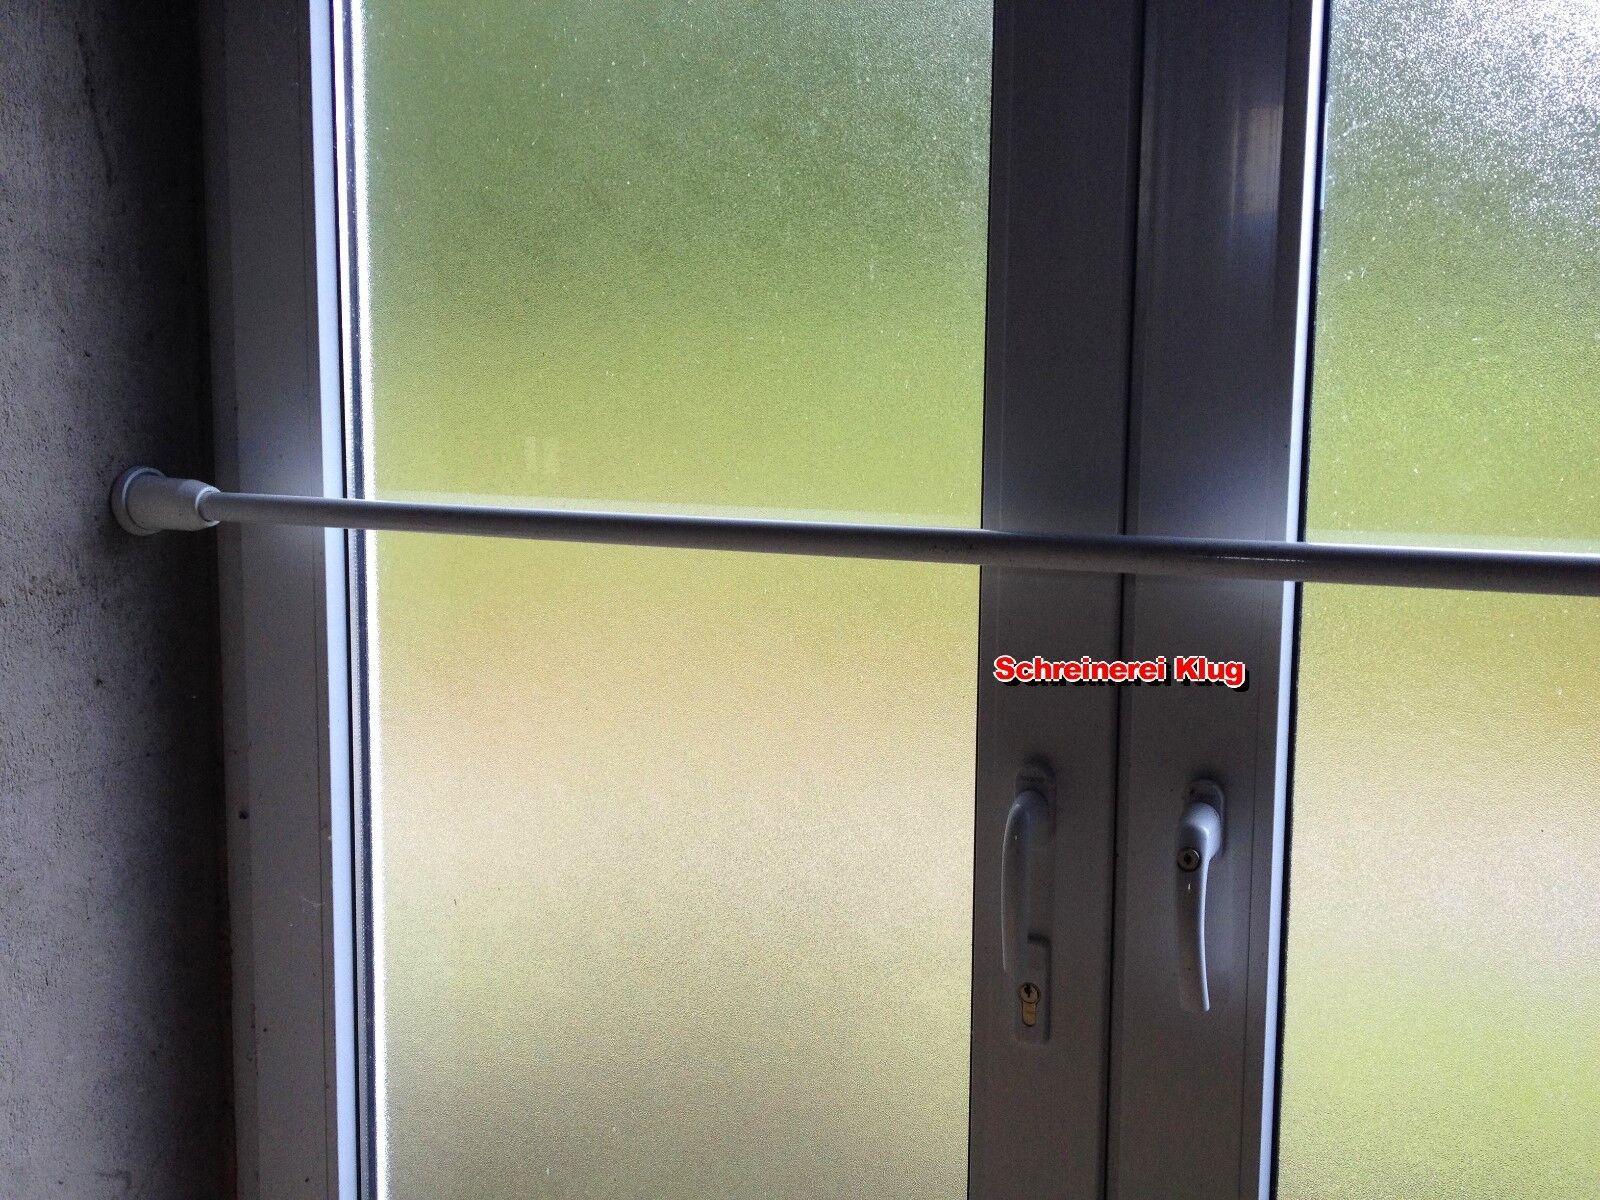 ADE Stange S Fenster-und Fenster-und Fenster-und Tür-Sicherung Einbruchschutz Stangenschloss Neuware | Moderate Kosten  c7830e